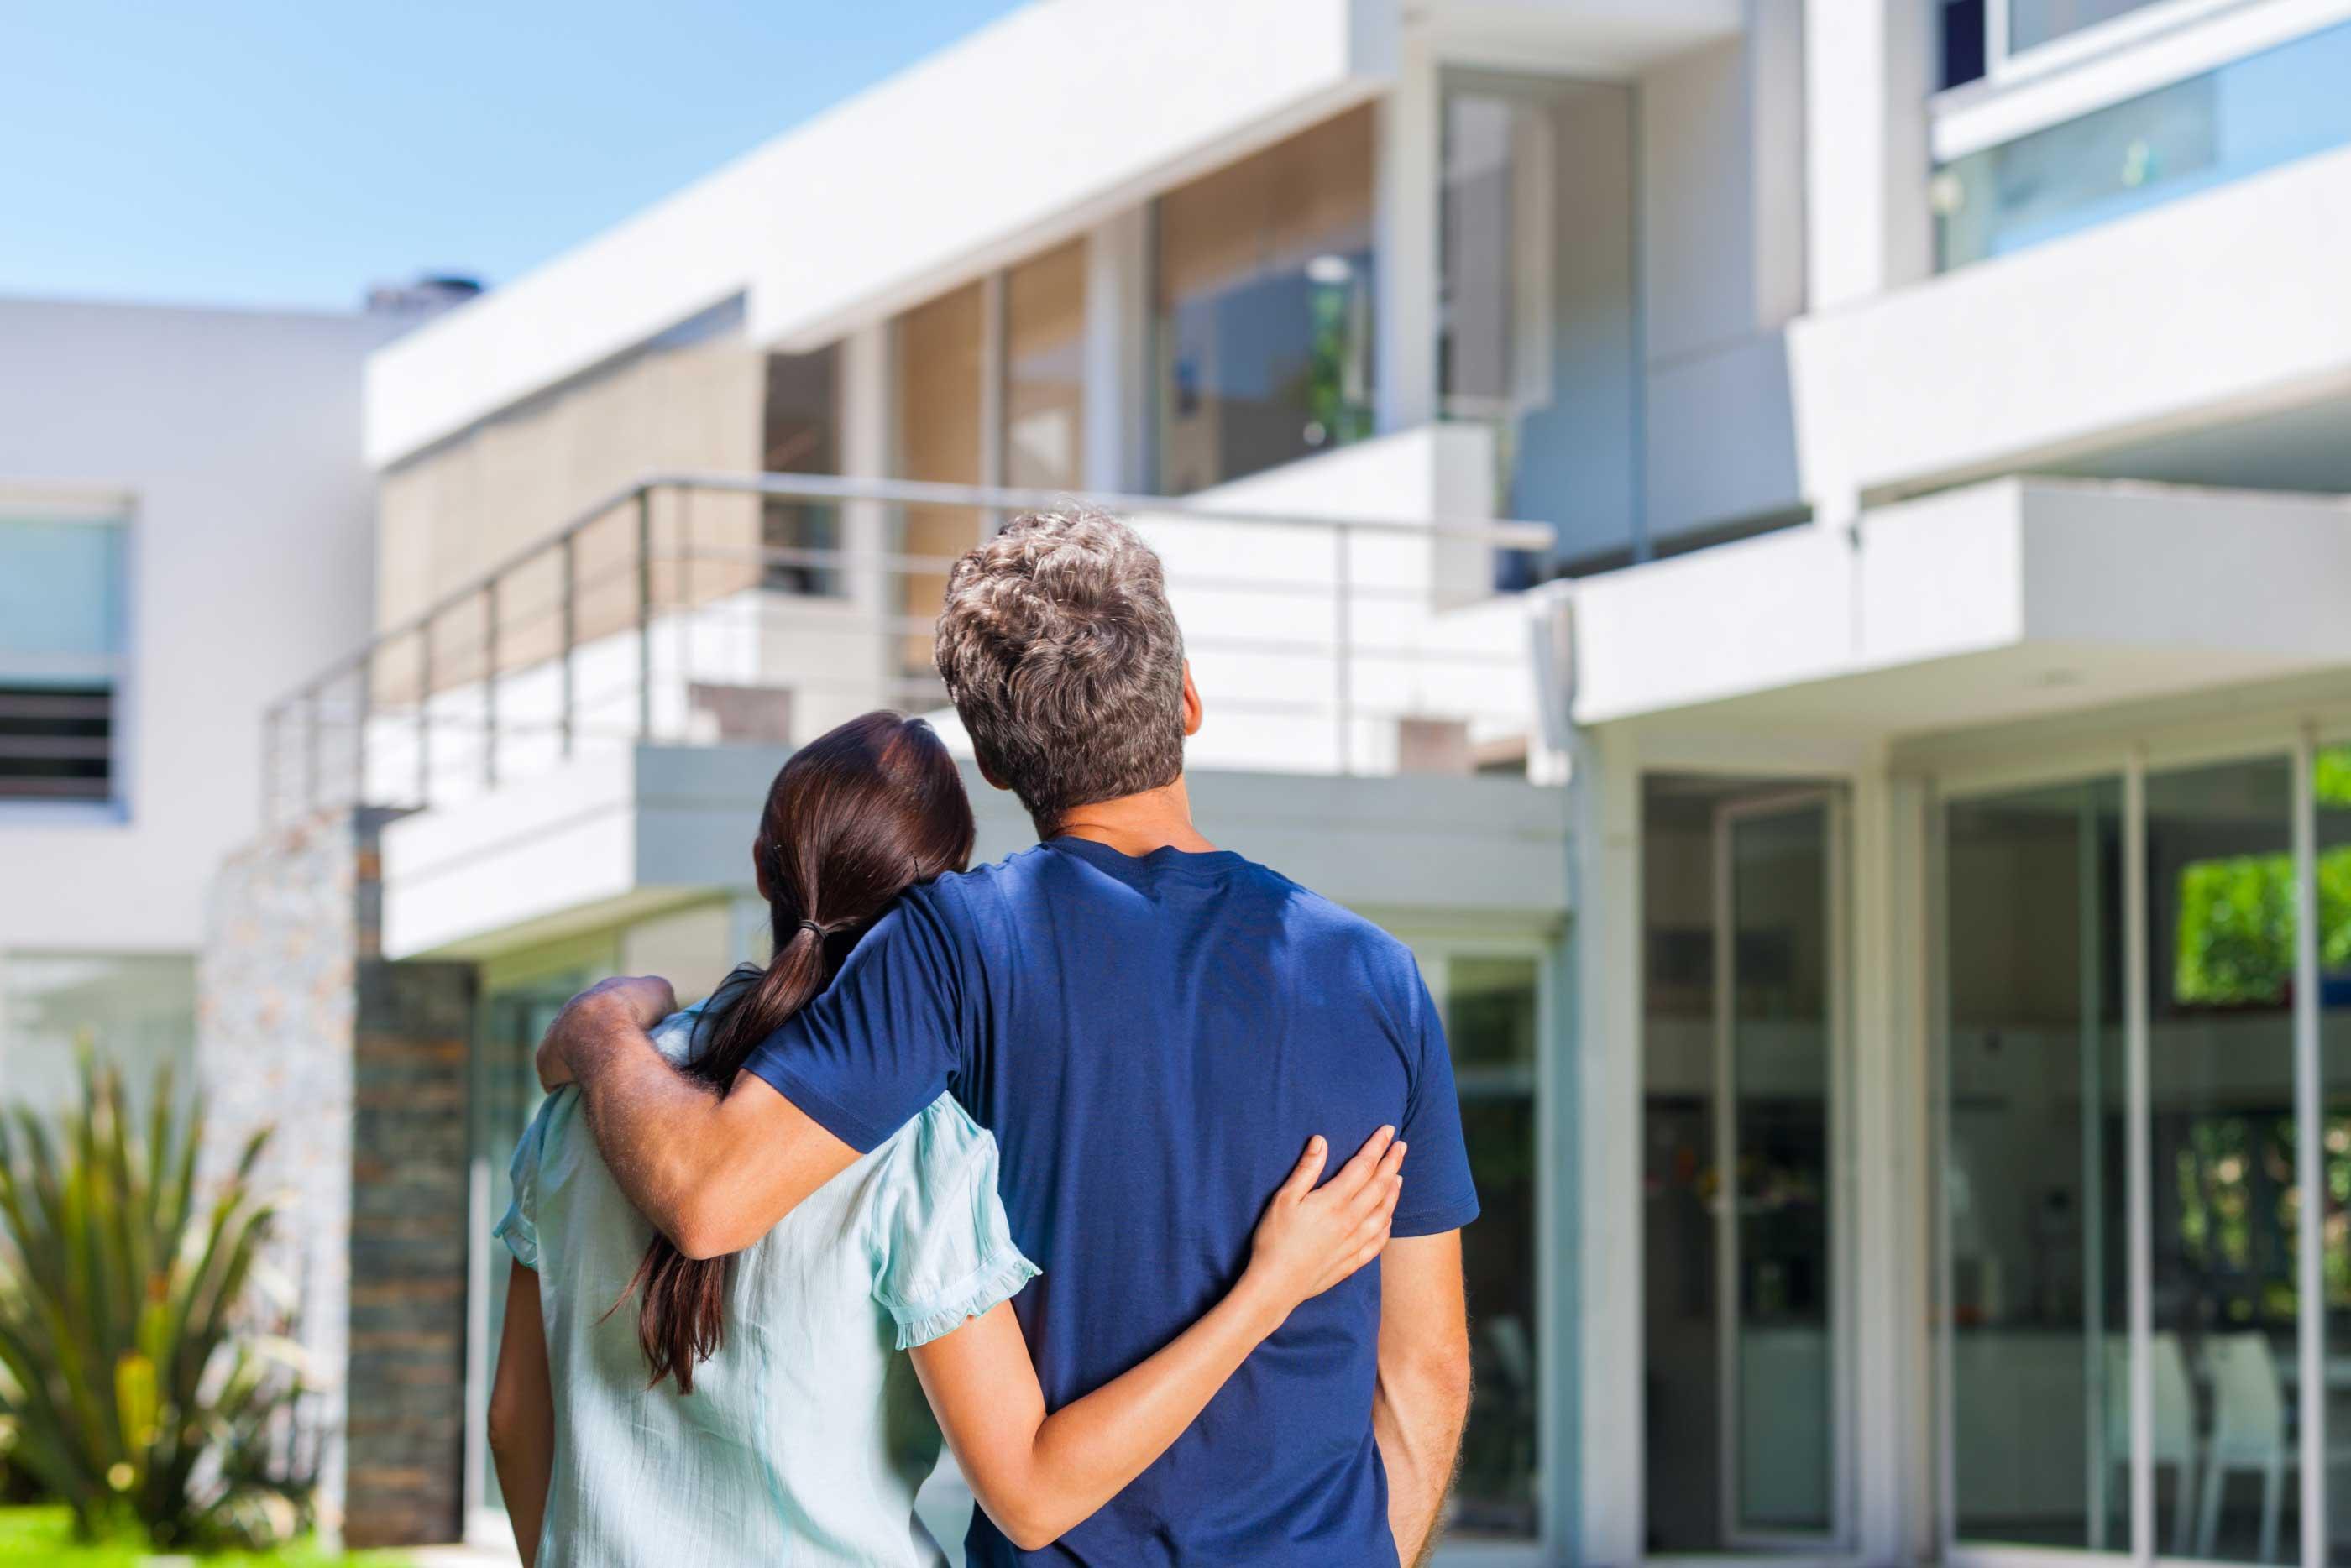 Новый закон об ипотеке испании. испания по-русски - все о жизни в испании